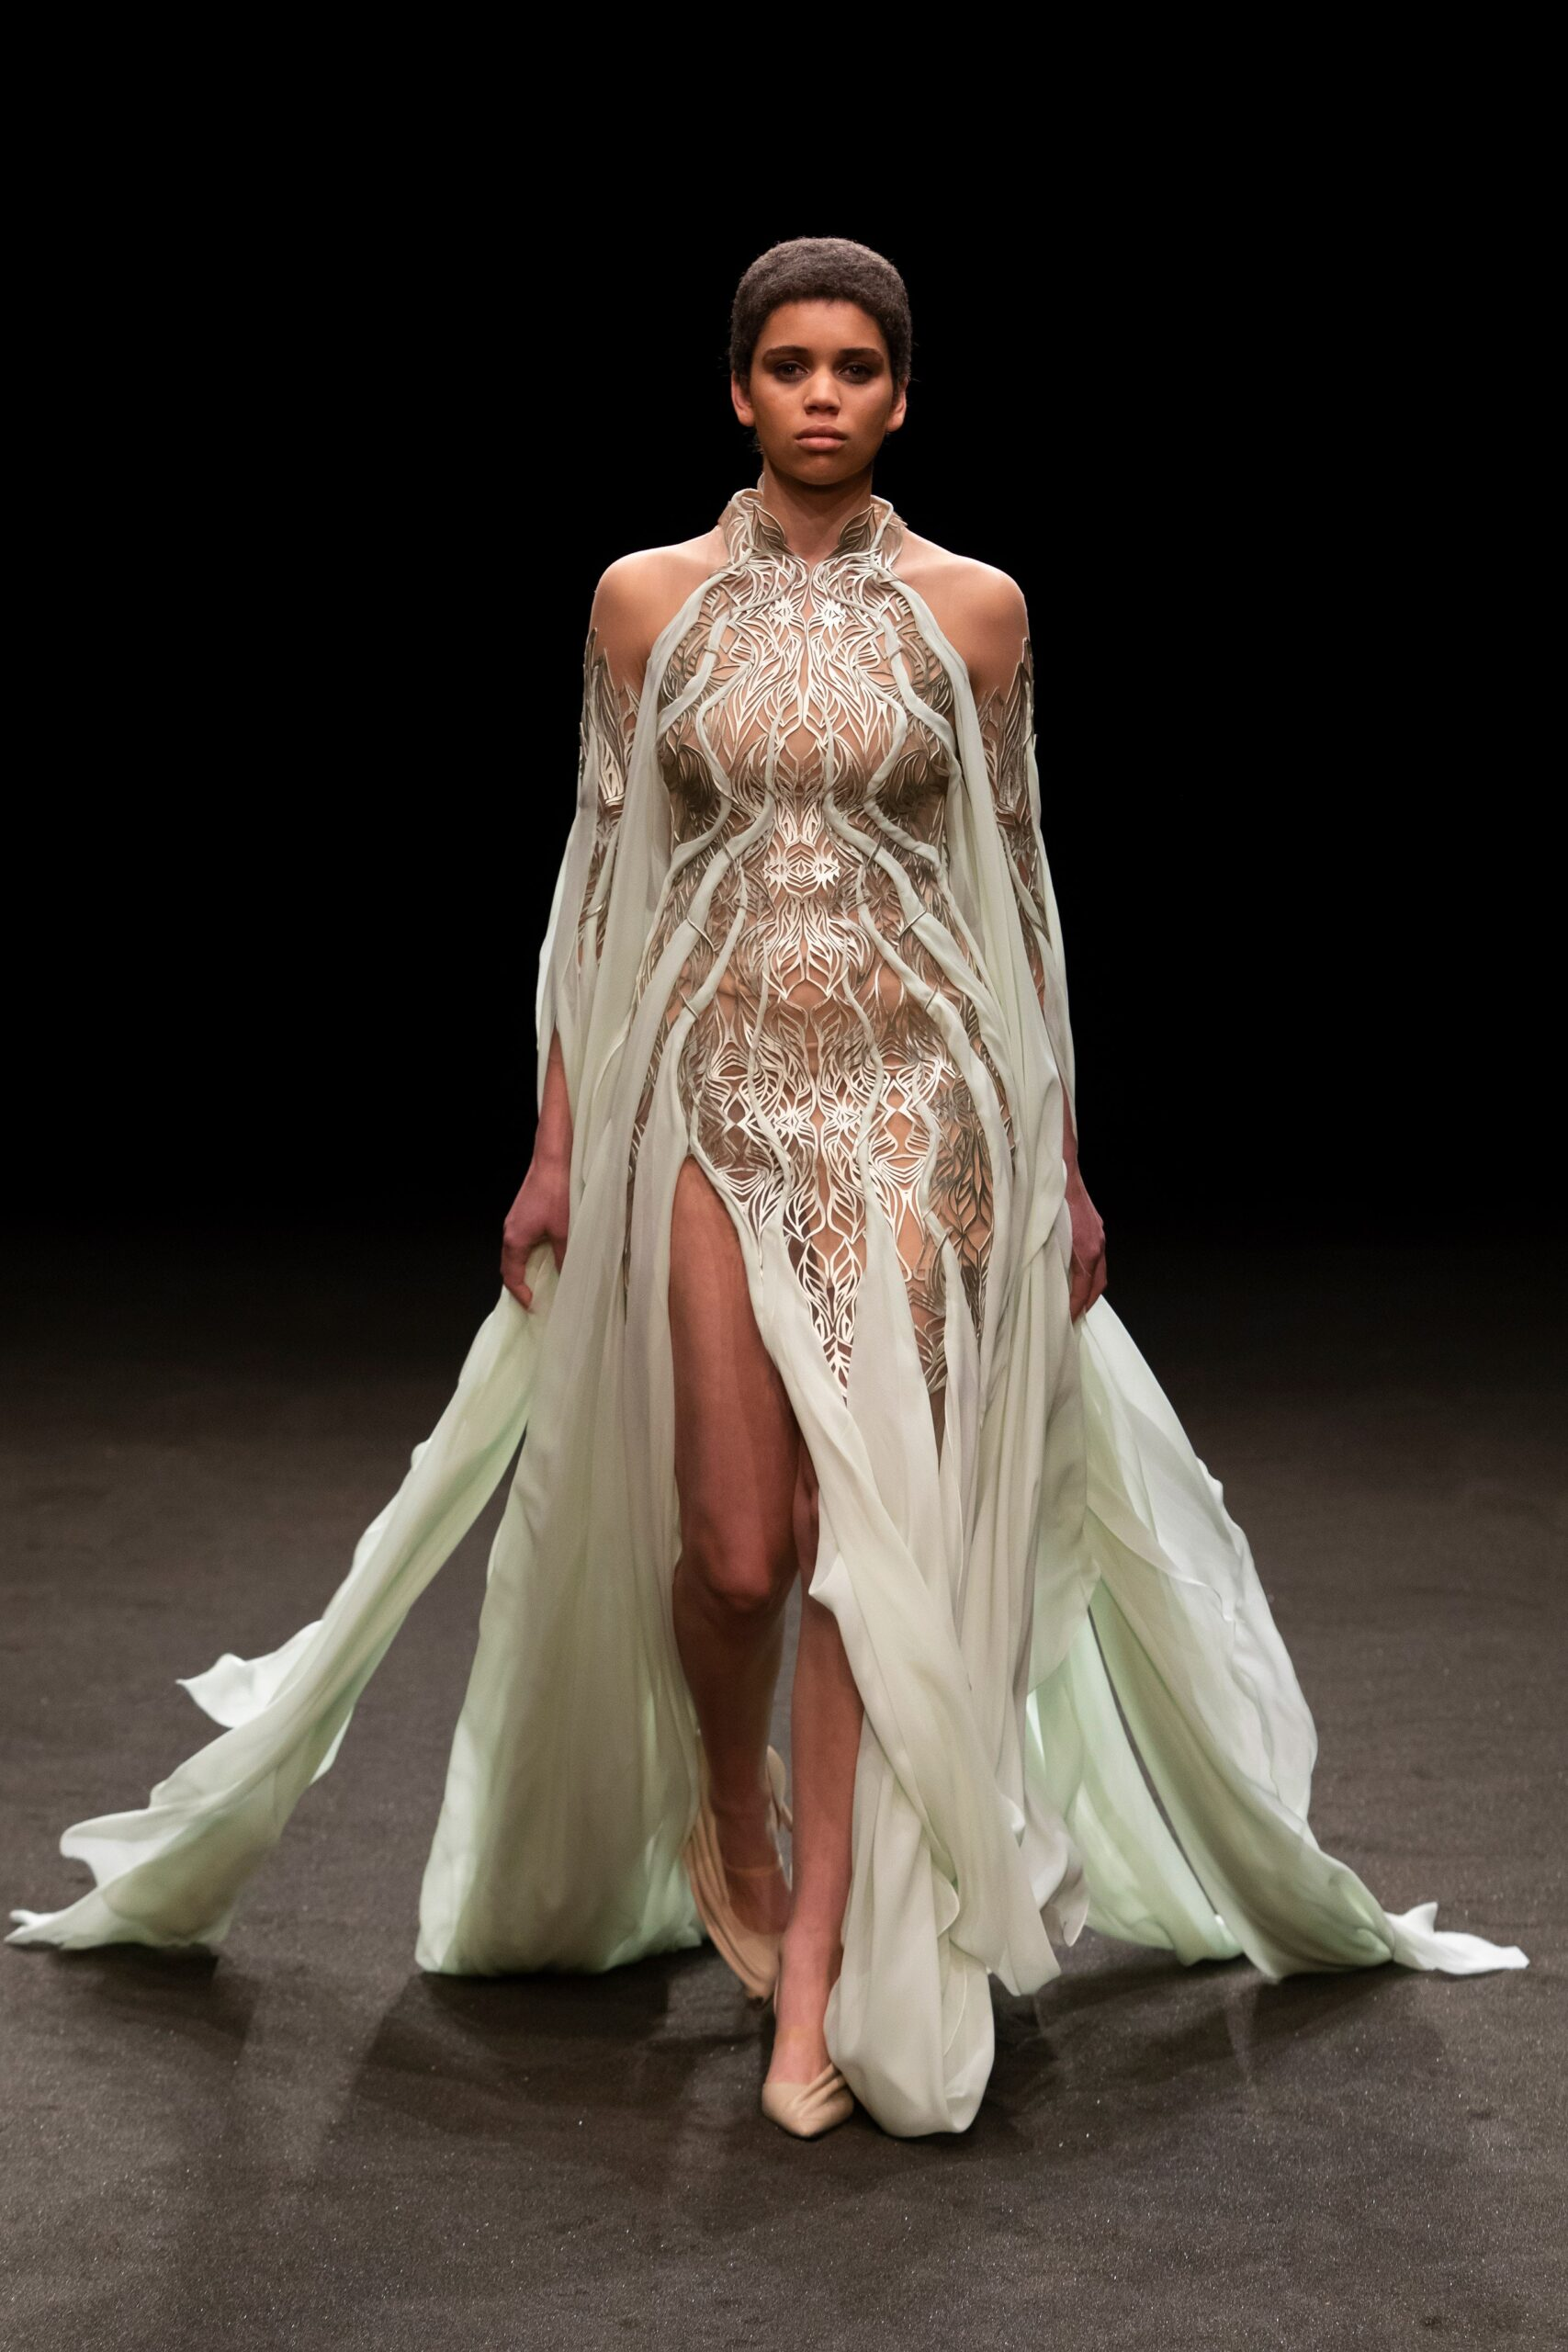 00004 Iris van Herpen Couture Spring 21 credit Gio Staiano